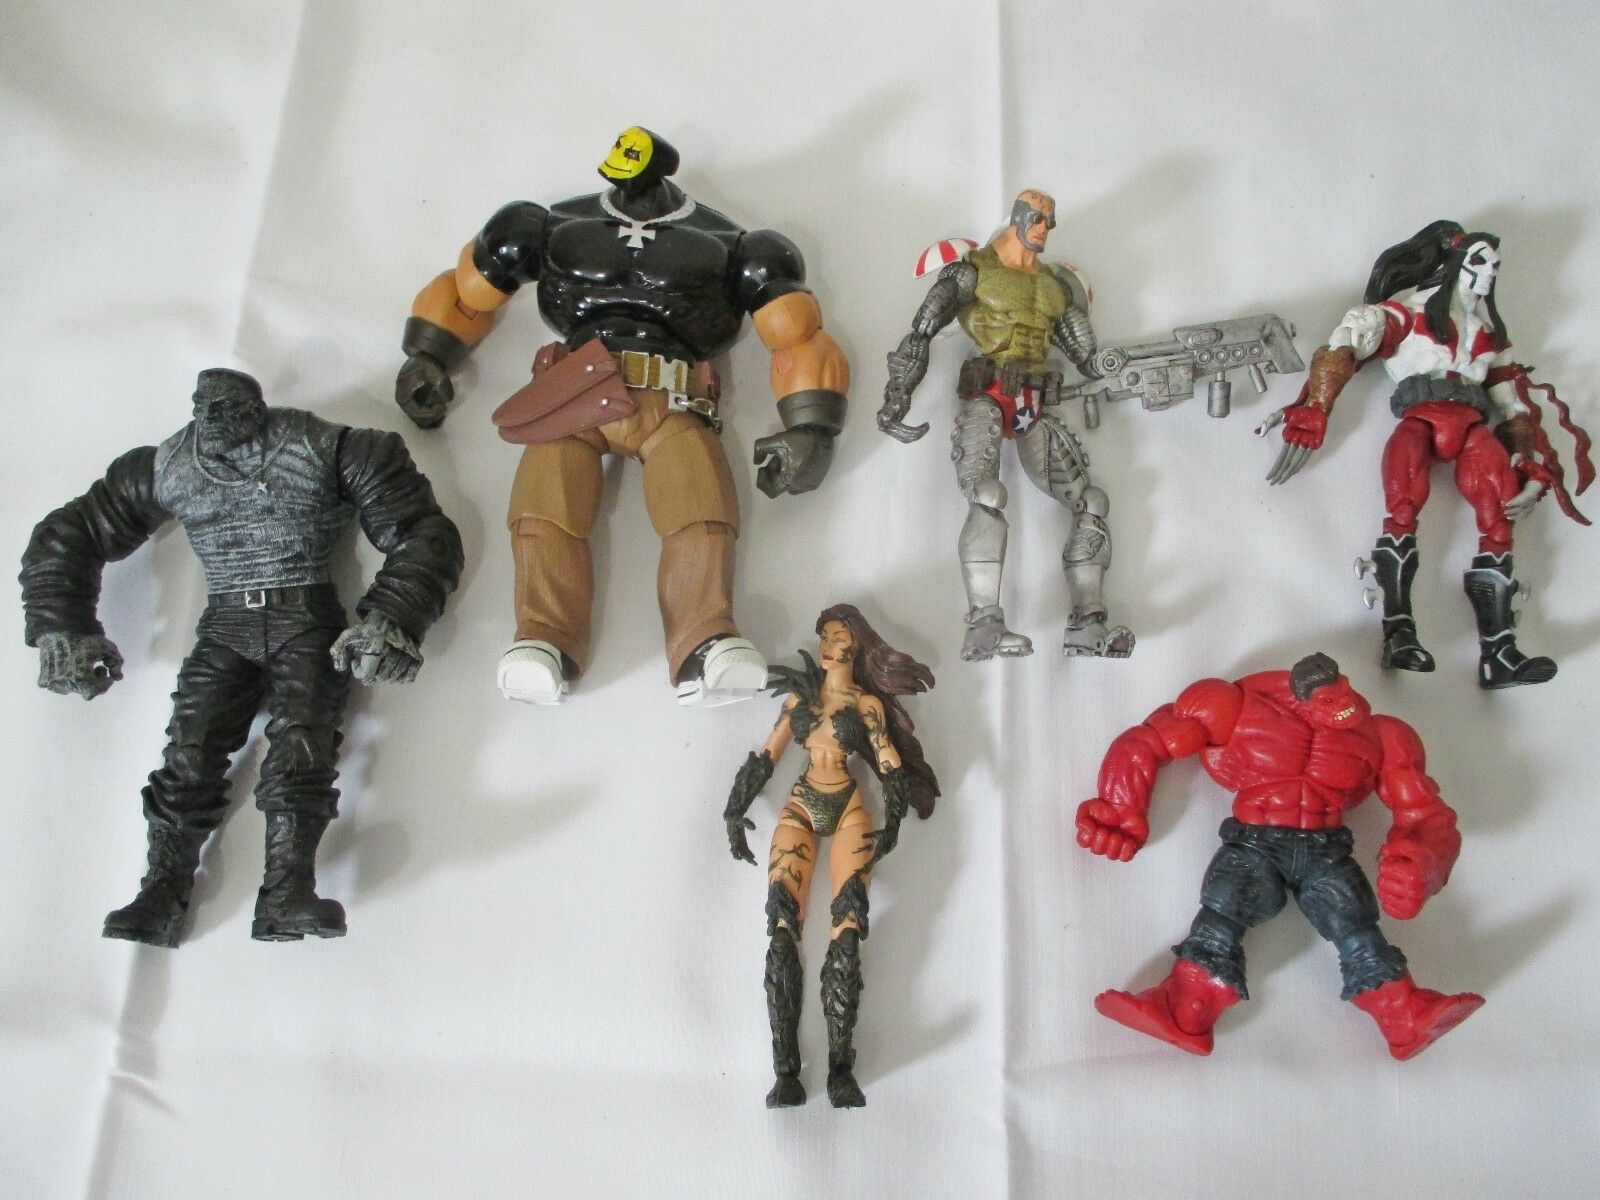 Marvel - figur viel clownface, witchblade, ripclaw, superpatriot, rote hulk. mehr